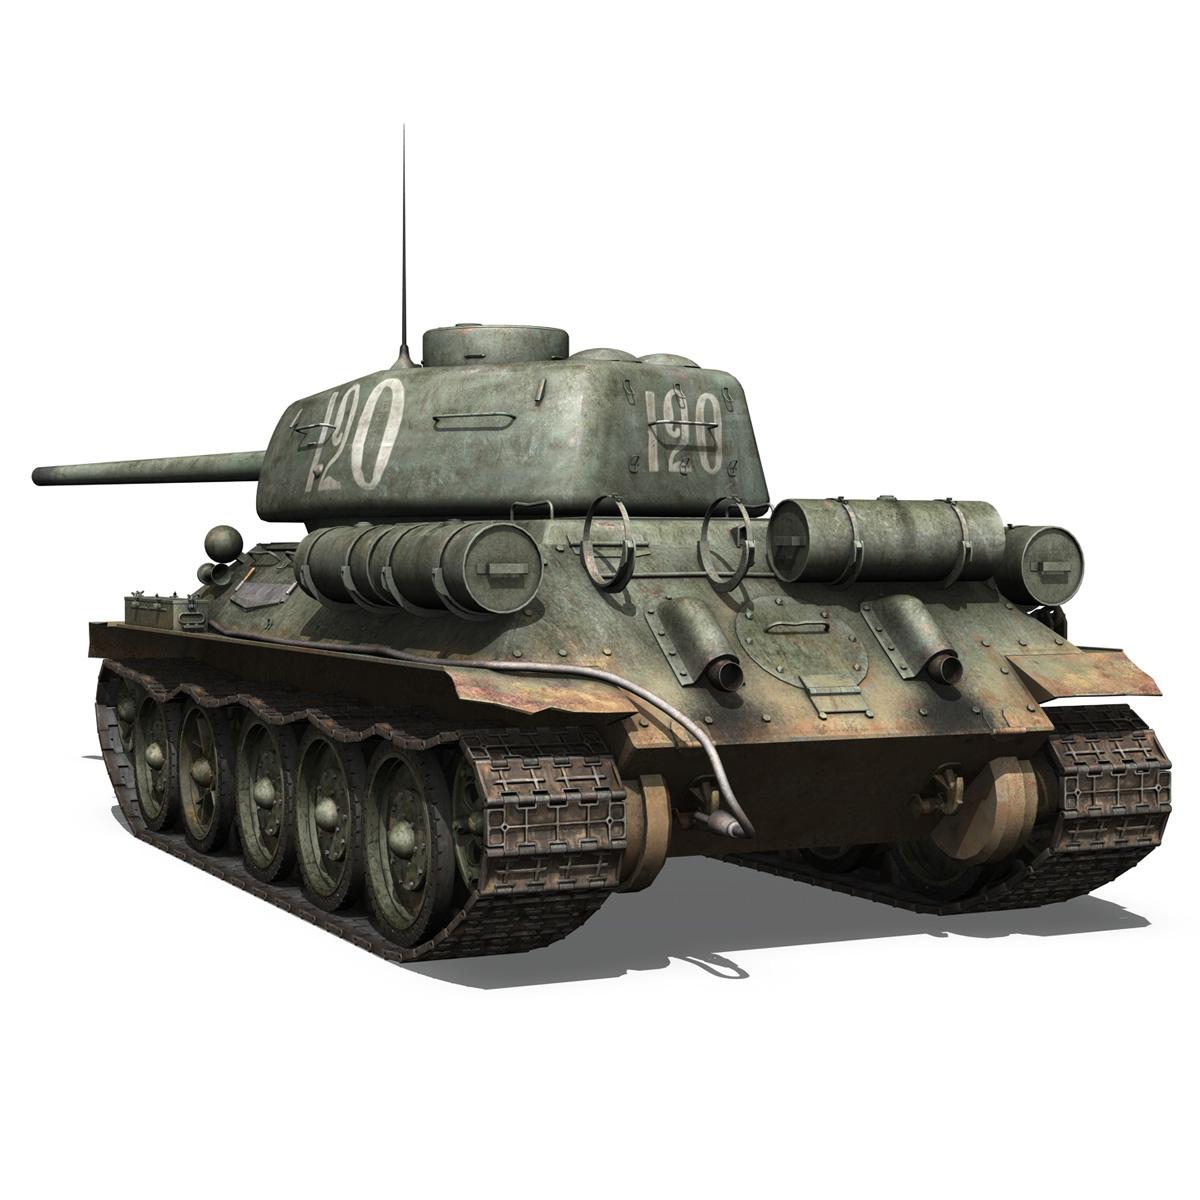 t-34 85 – soviet medium tank – 120 3d model 3ds fbx lwo lw lws obj c4d 265373